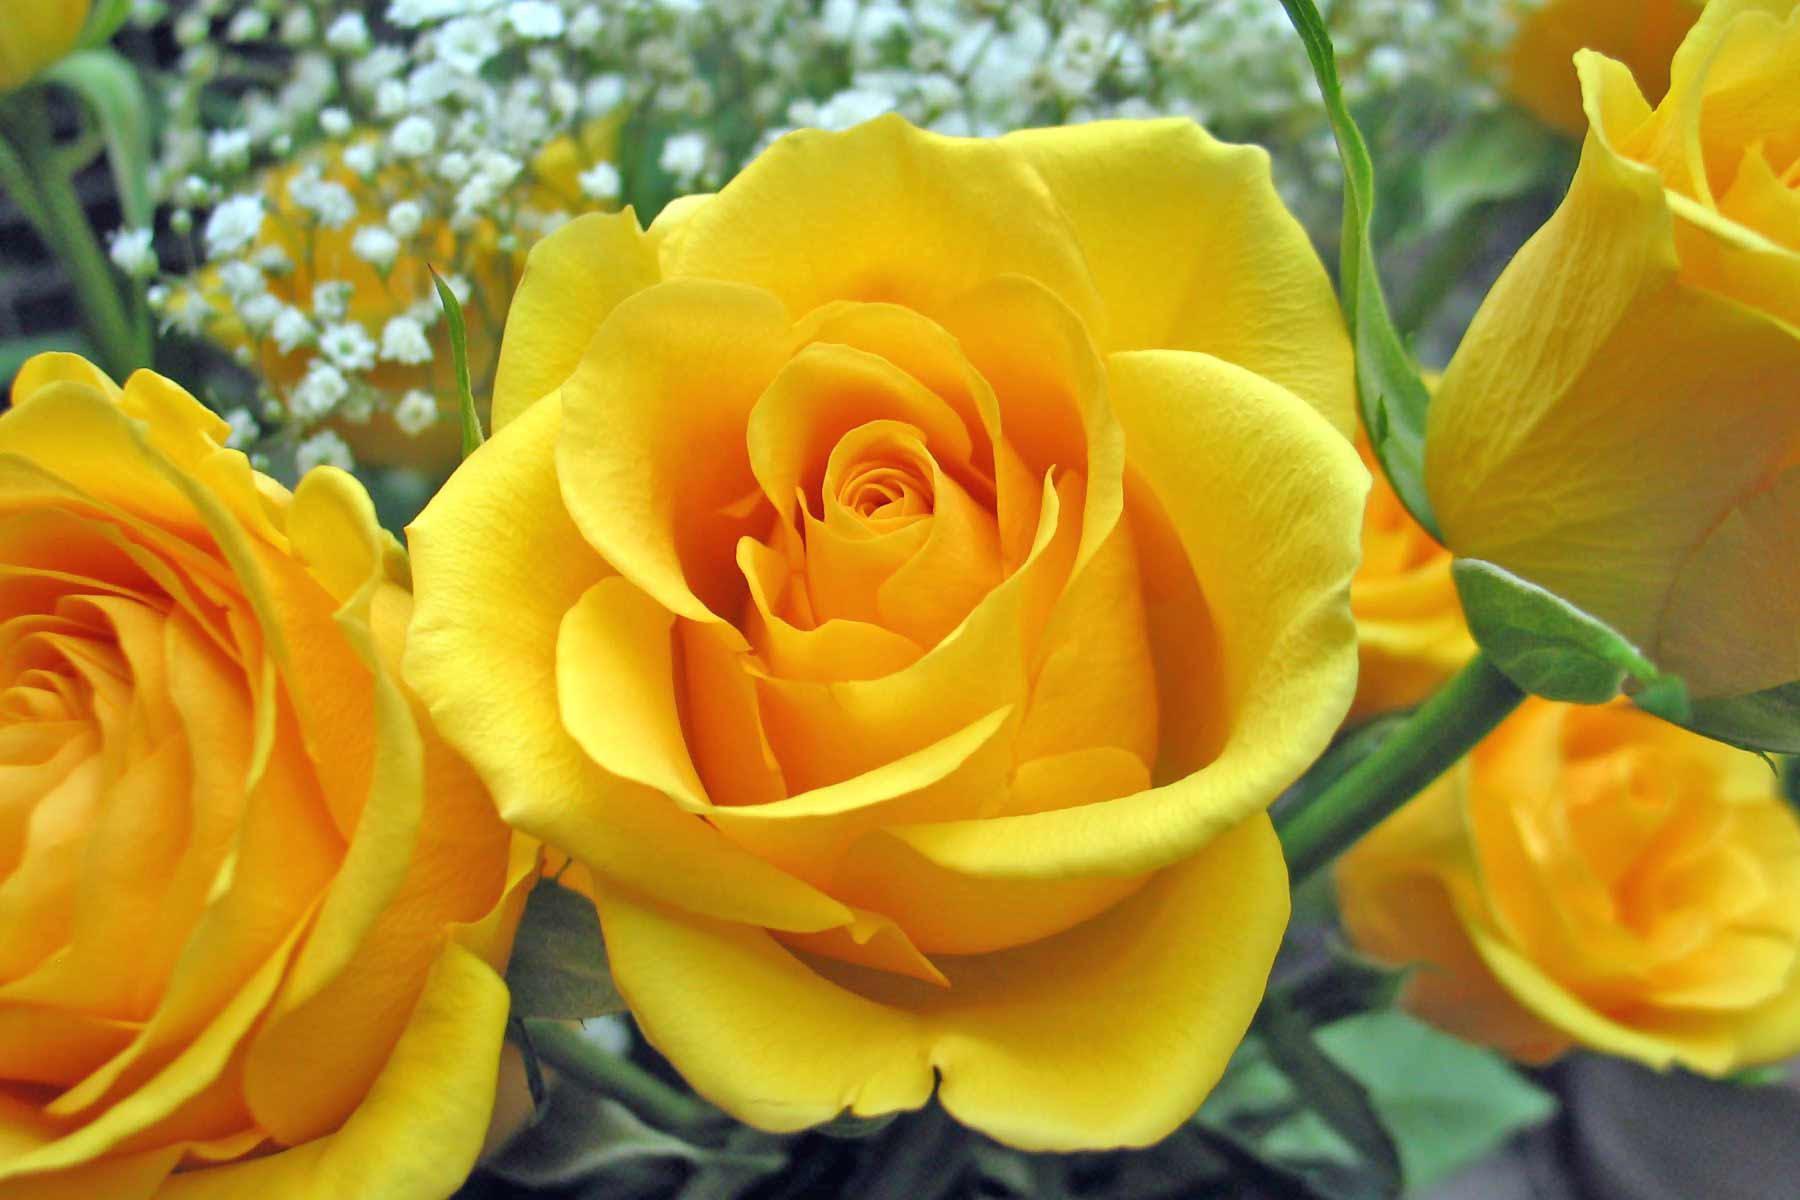 http://teguh77.files.wordpress.com/2010/02/single-yellow-rose.jpg